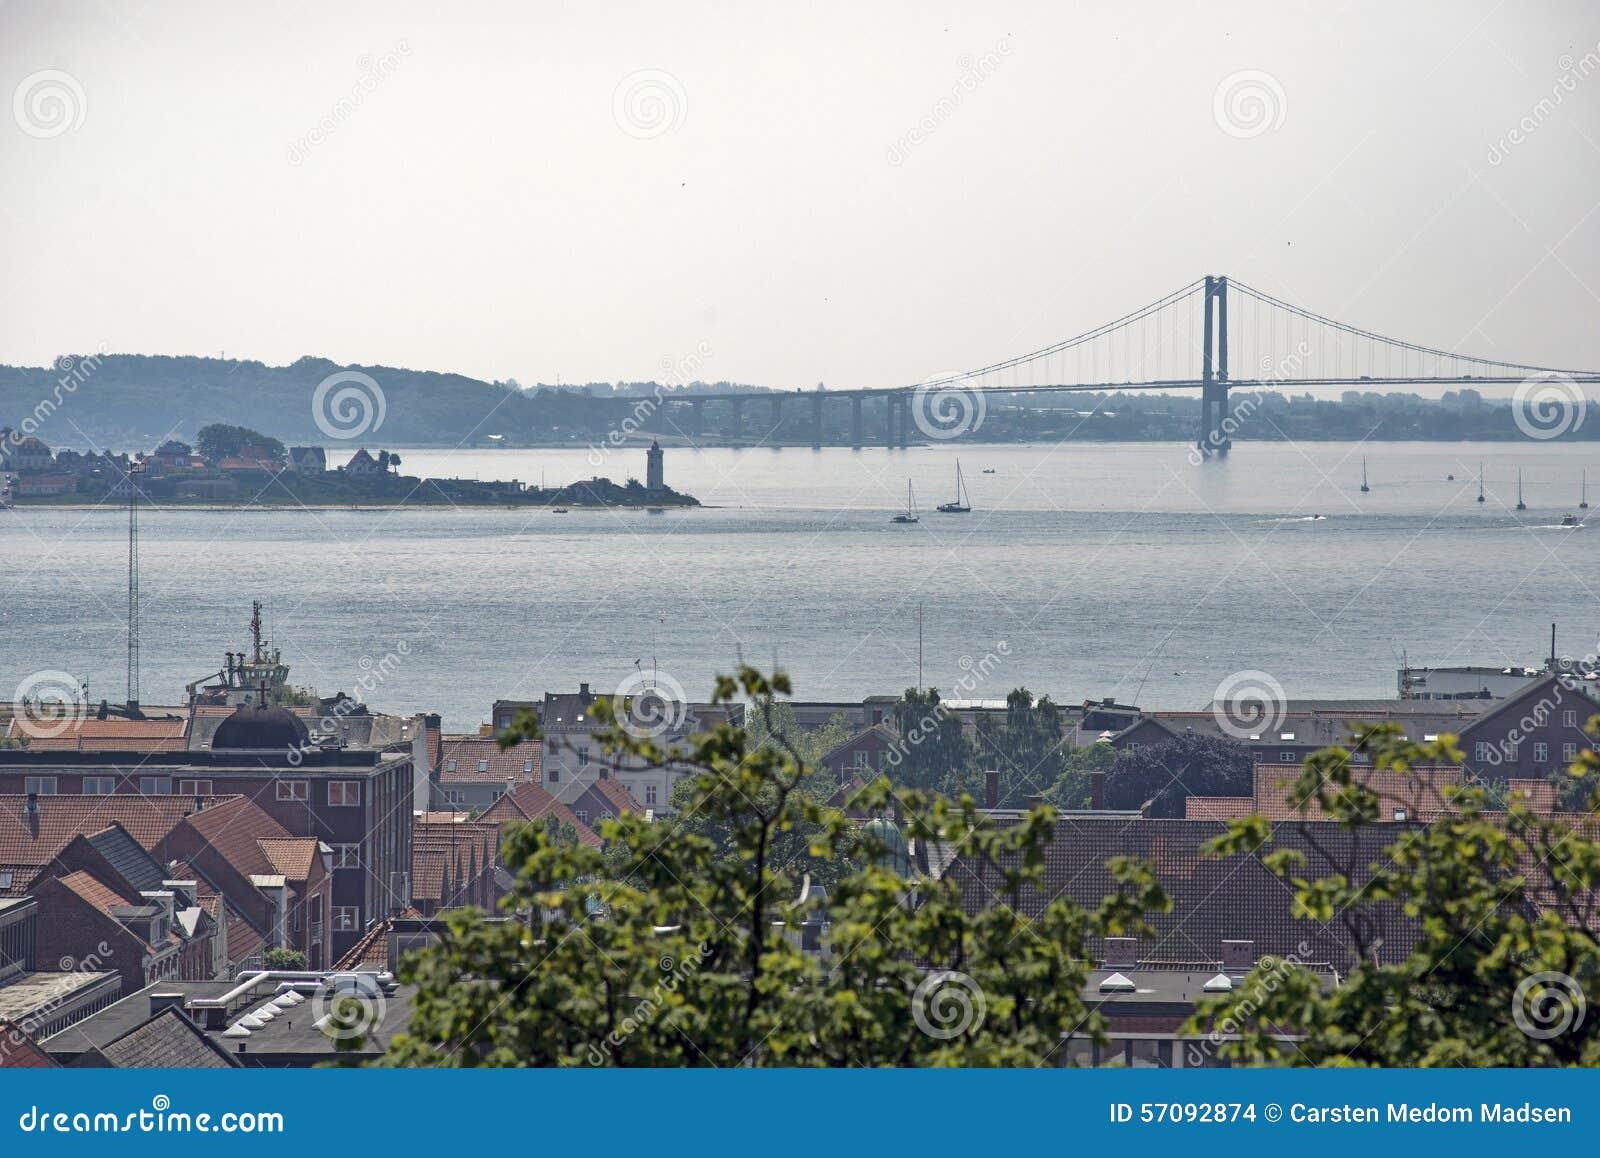 Miasteczko, latarnia morska i most,